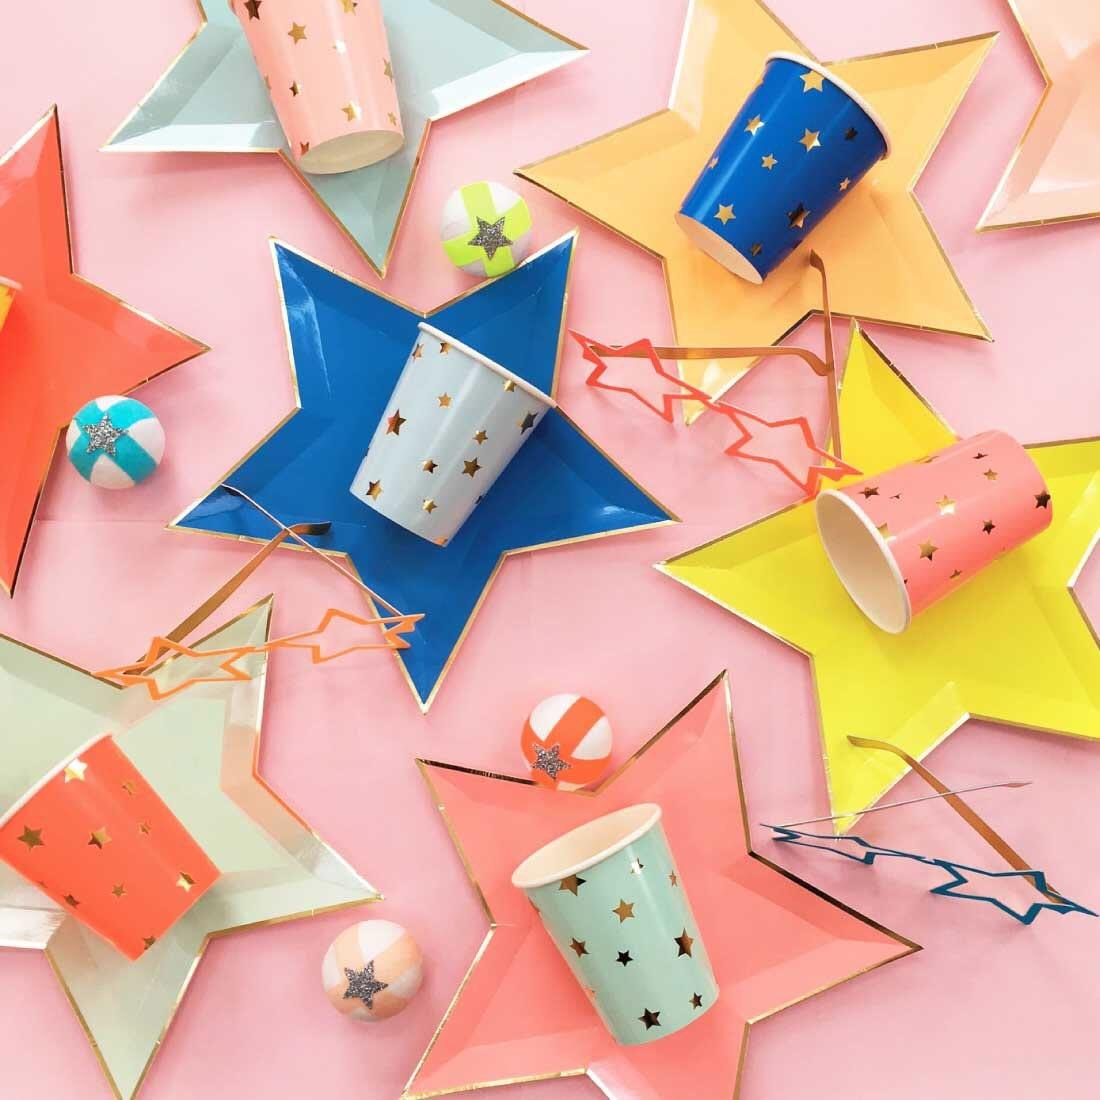 Star Shaped Plates (8) Meri Meri Jazzy Star Paper Plates Birthday Party Pastel Rainbow First Birthday Ideas Graduation Party Decor  sc 1 st  Etsy & Star Shaped Plates 8 Meri Meri Jazzy Star Paper Plates